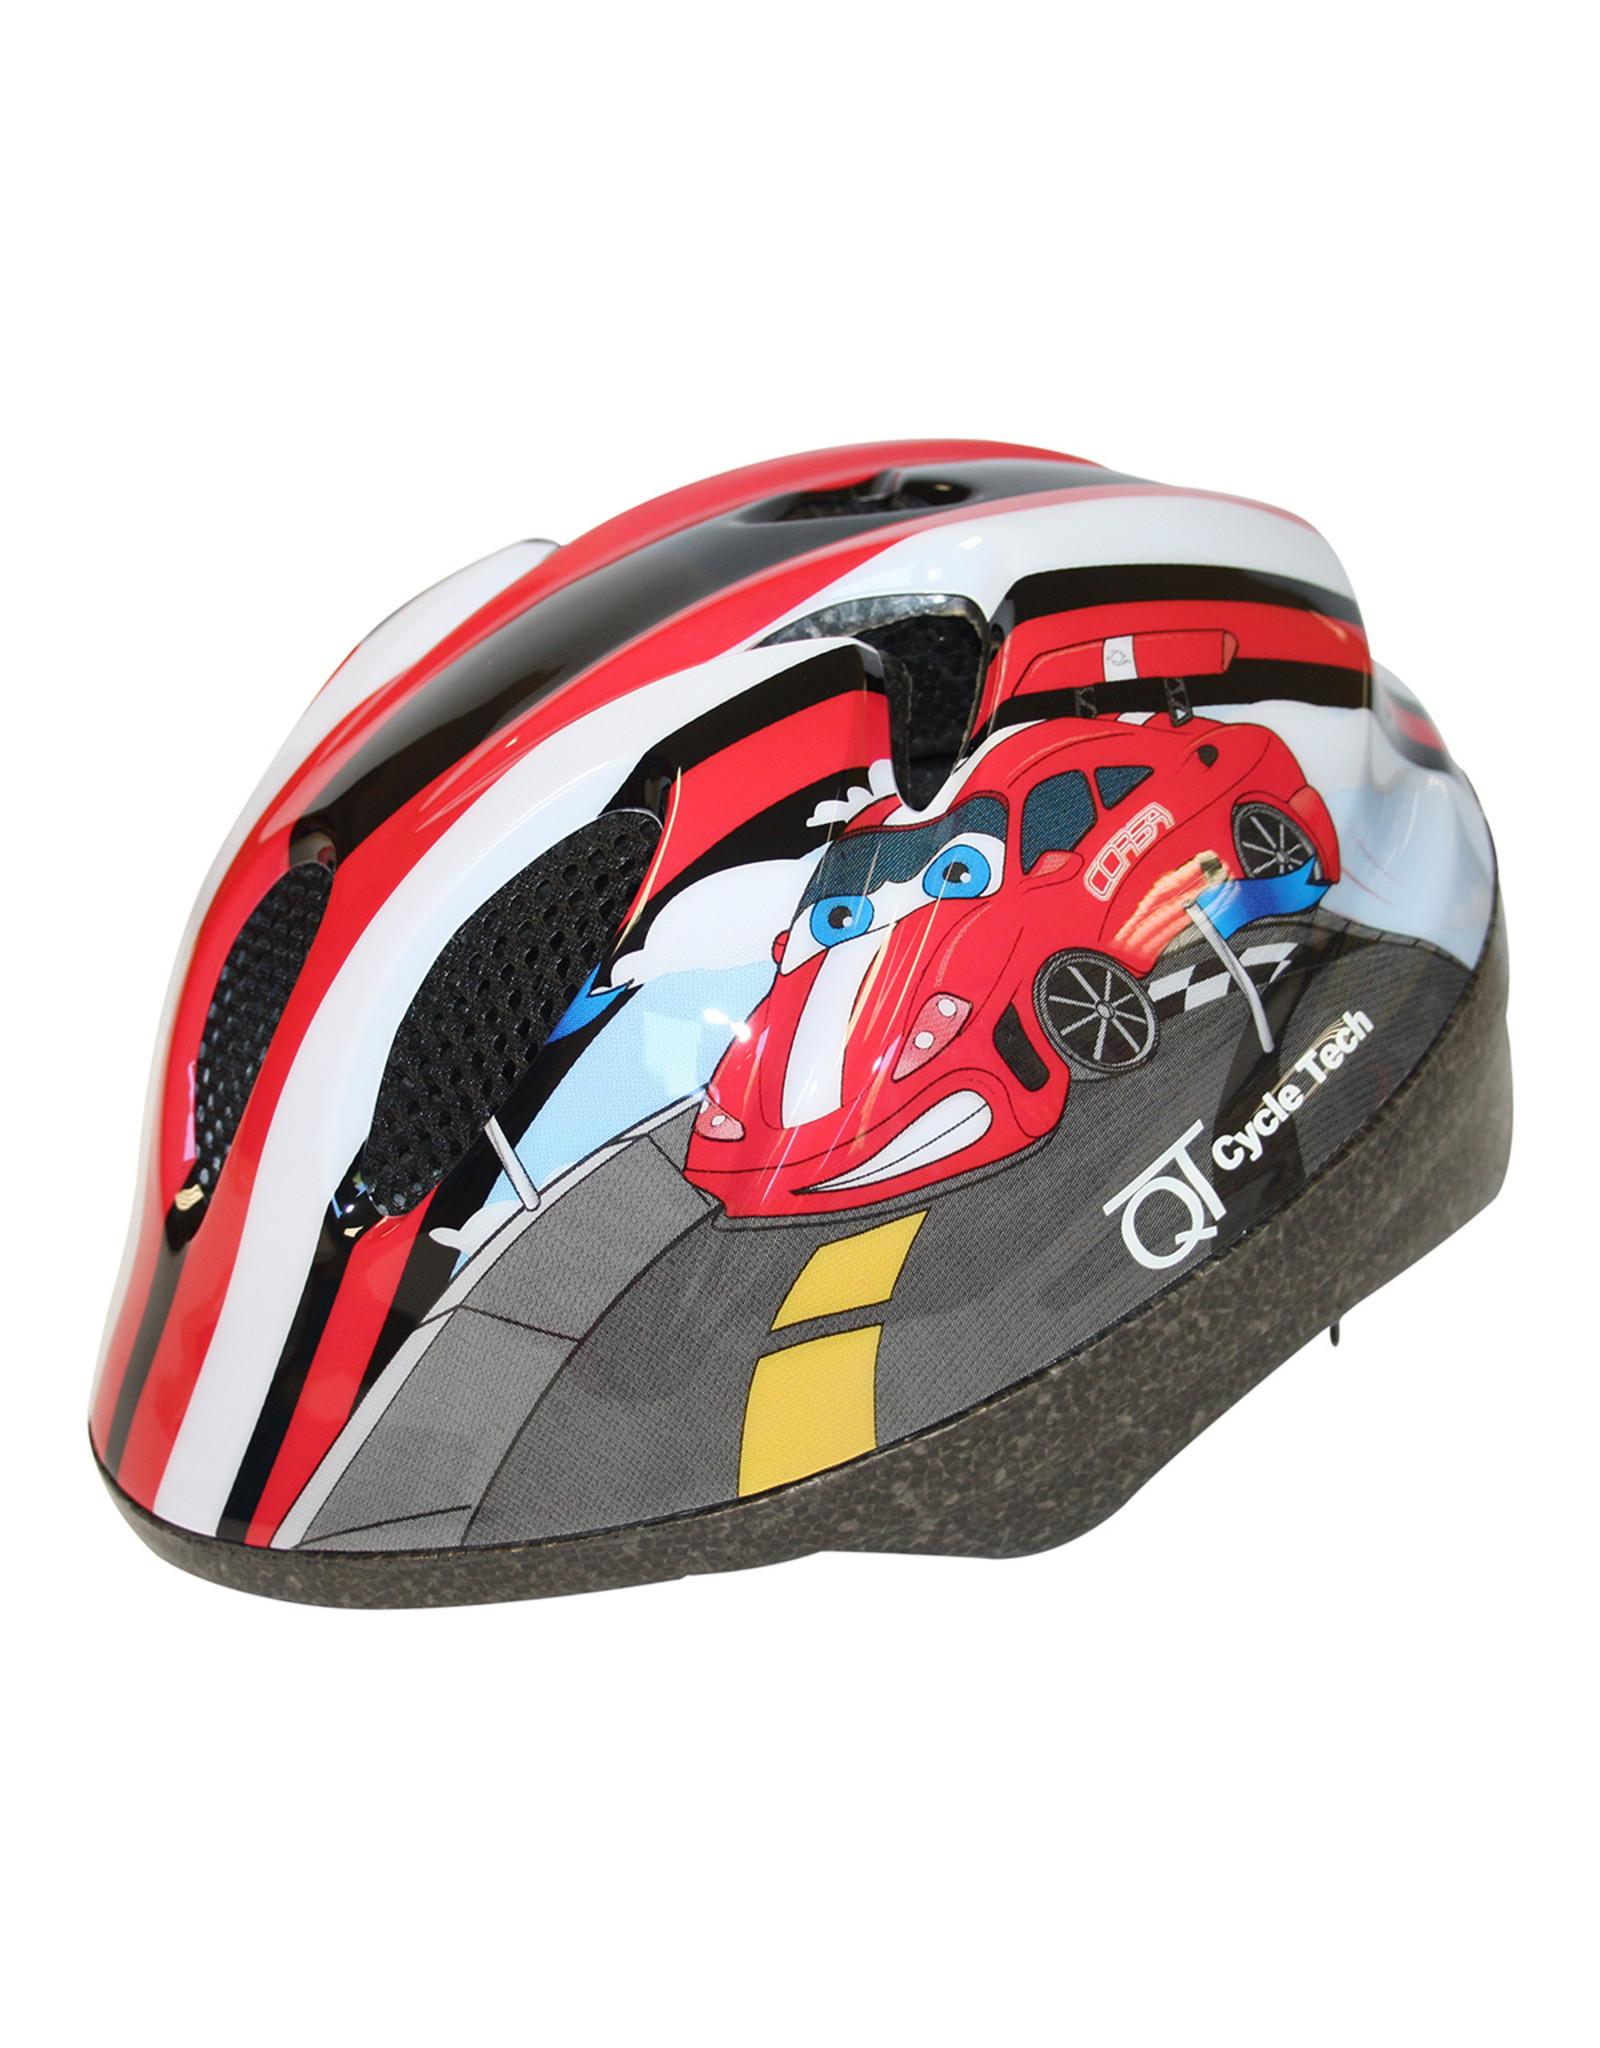 QT fietshelm kleuter Corsa